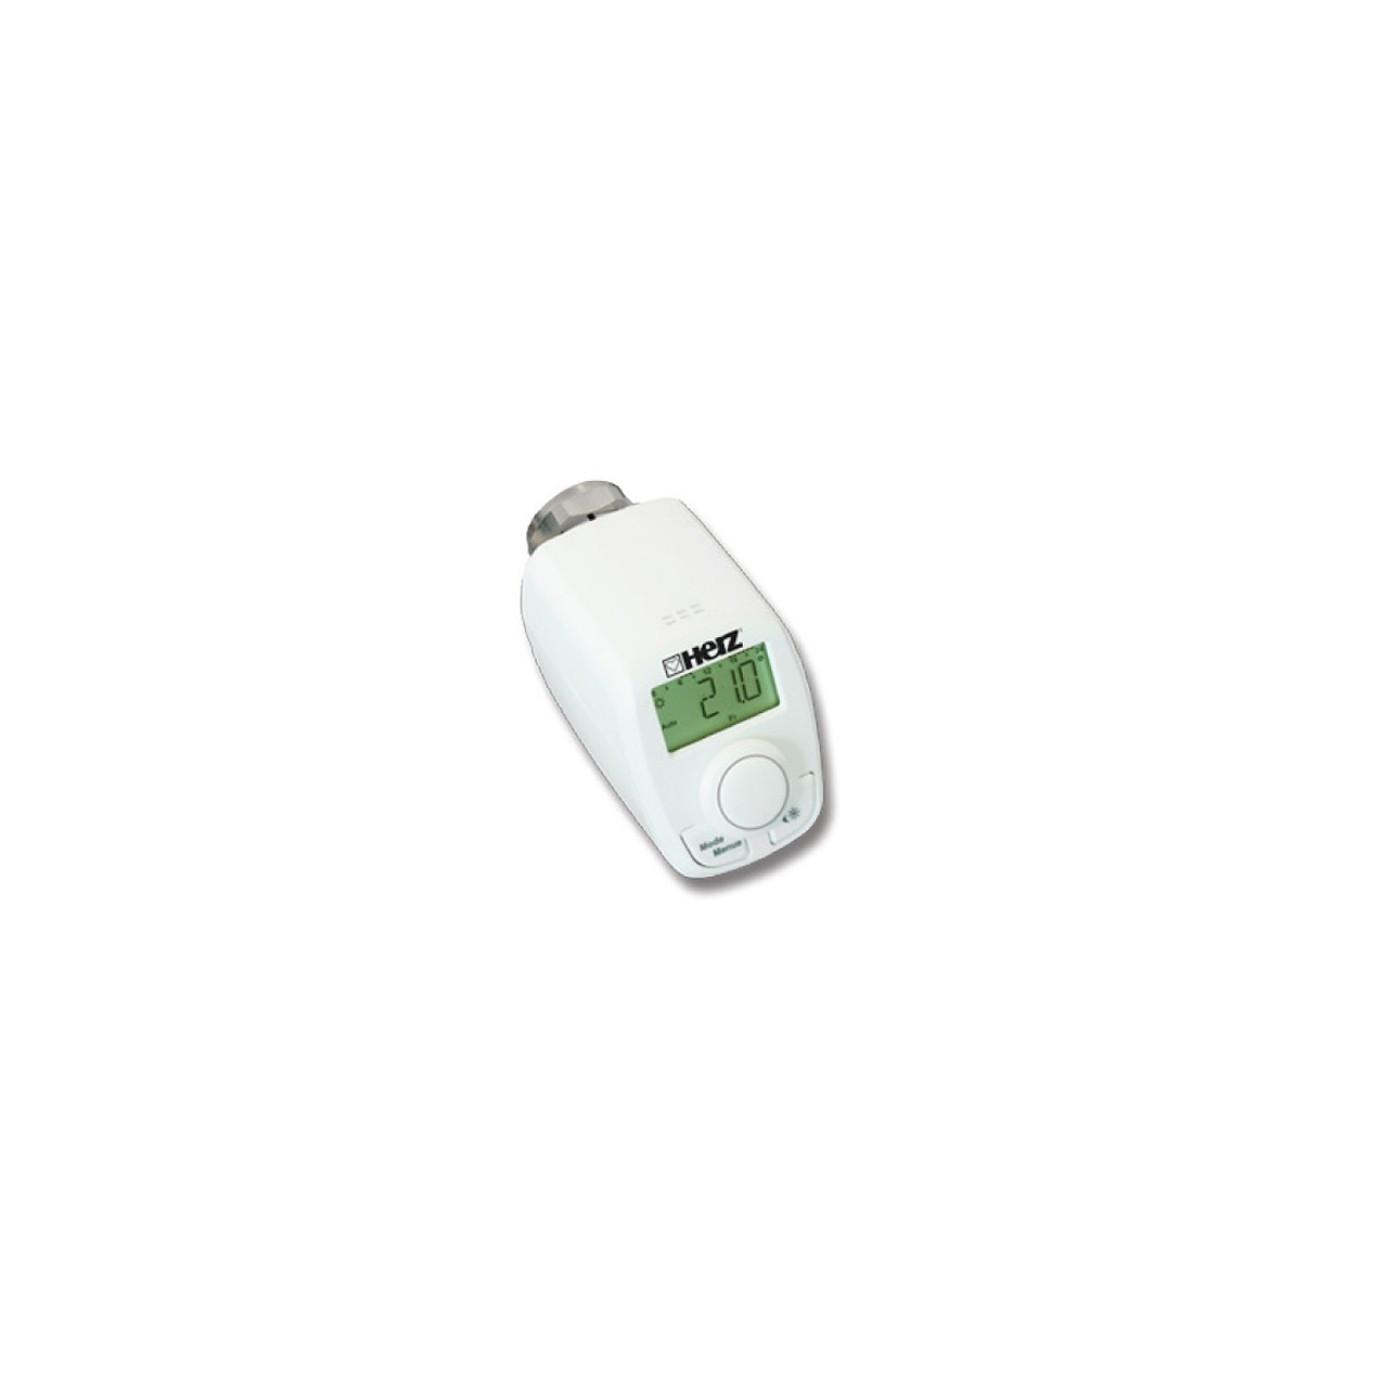 elektronischer thermostatkopf herz thermostat m 28x1 5 kopf ventil heizung heizk rper f hler. Black Bedroom Furniture Sets. Home Design Ideas